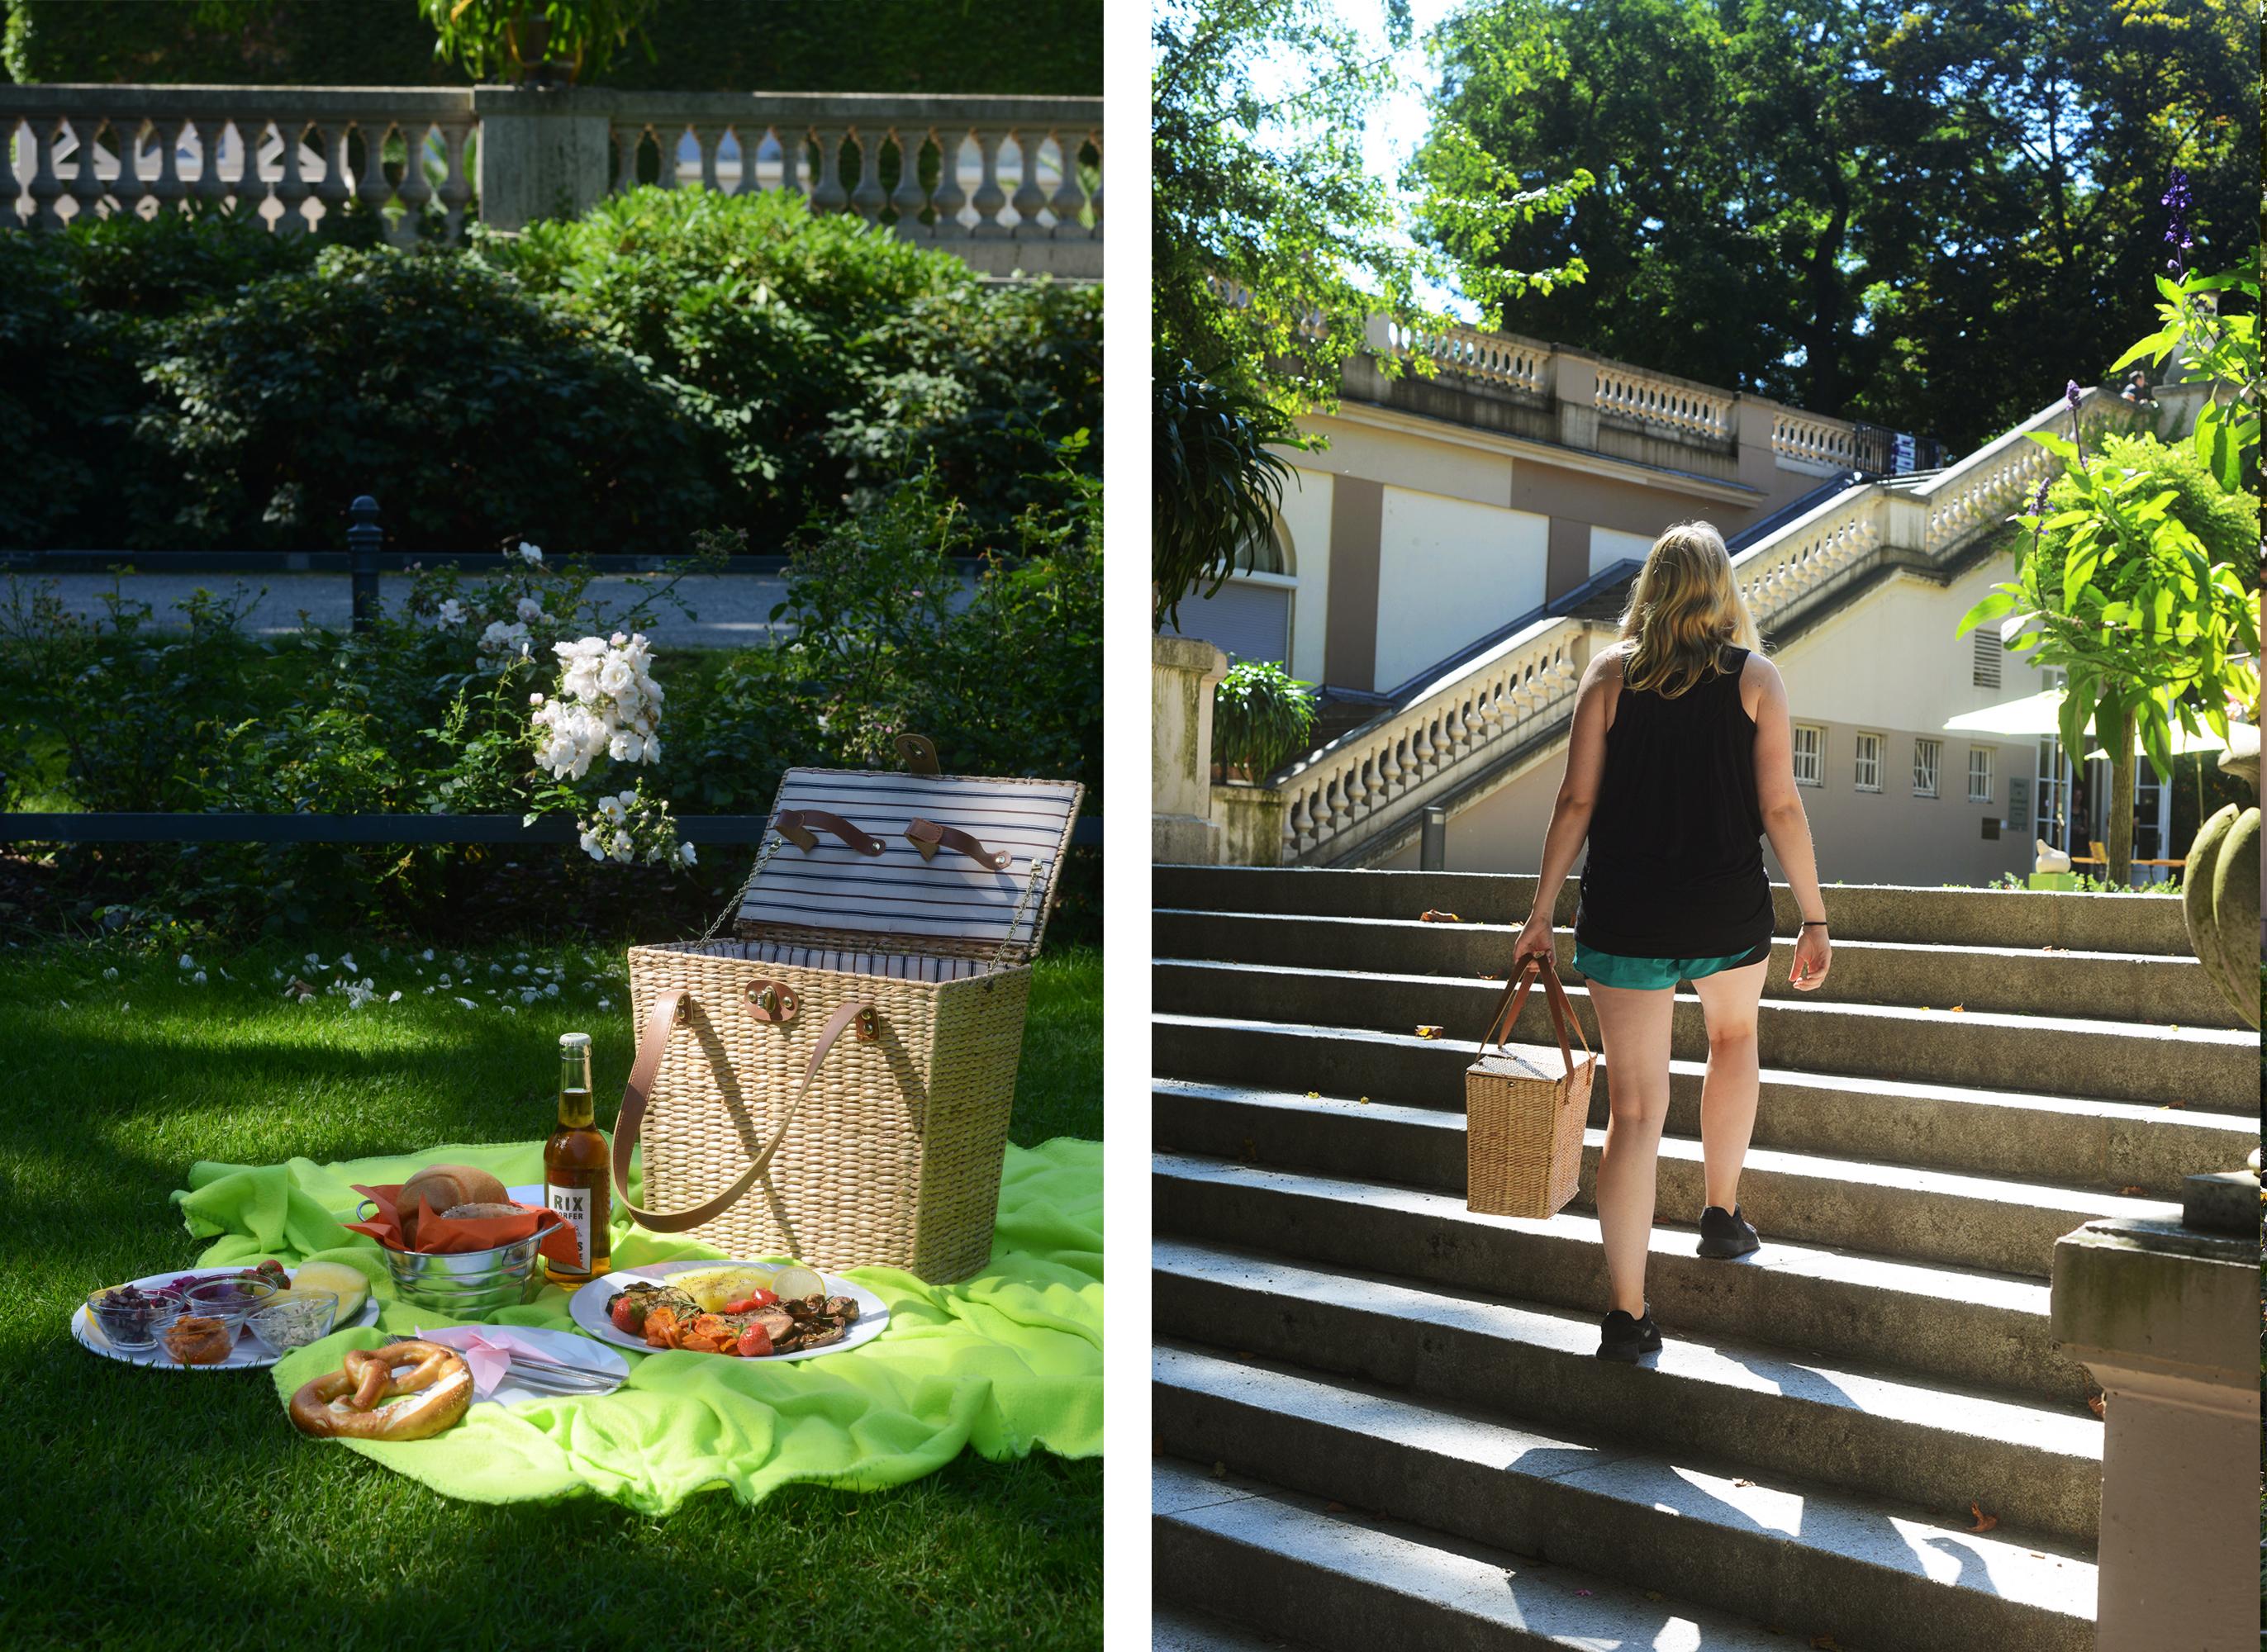 tabea-mathern_hunting-down-berlin-summer-koernerpark-1